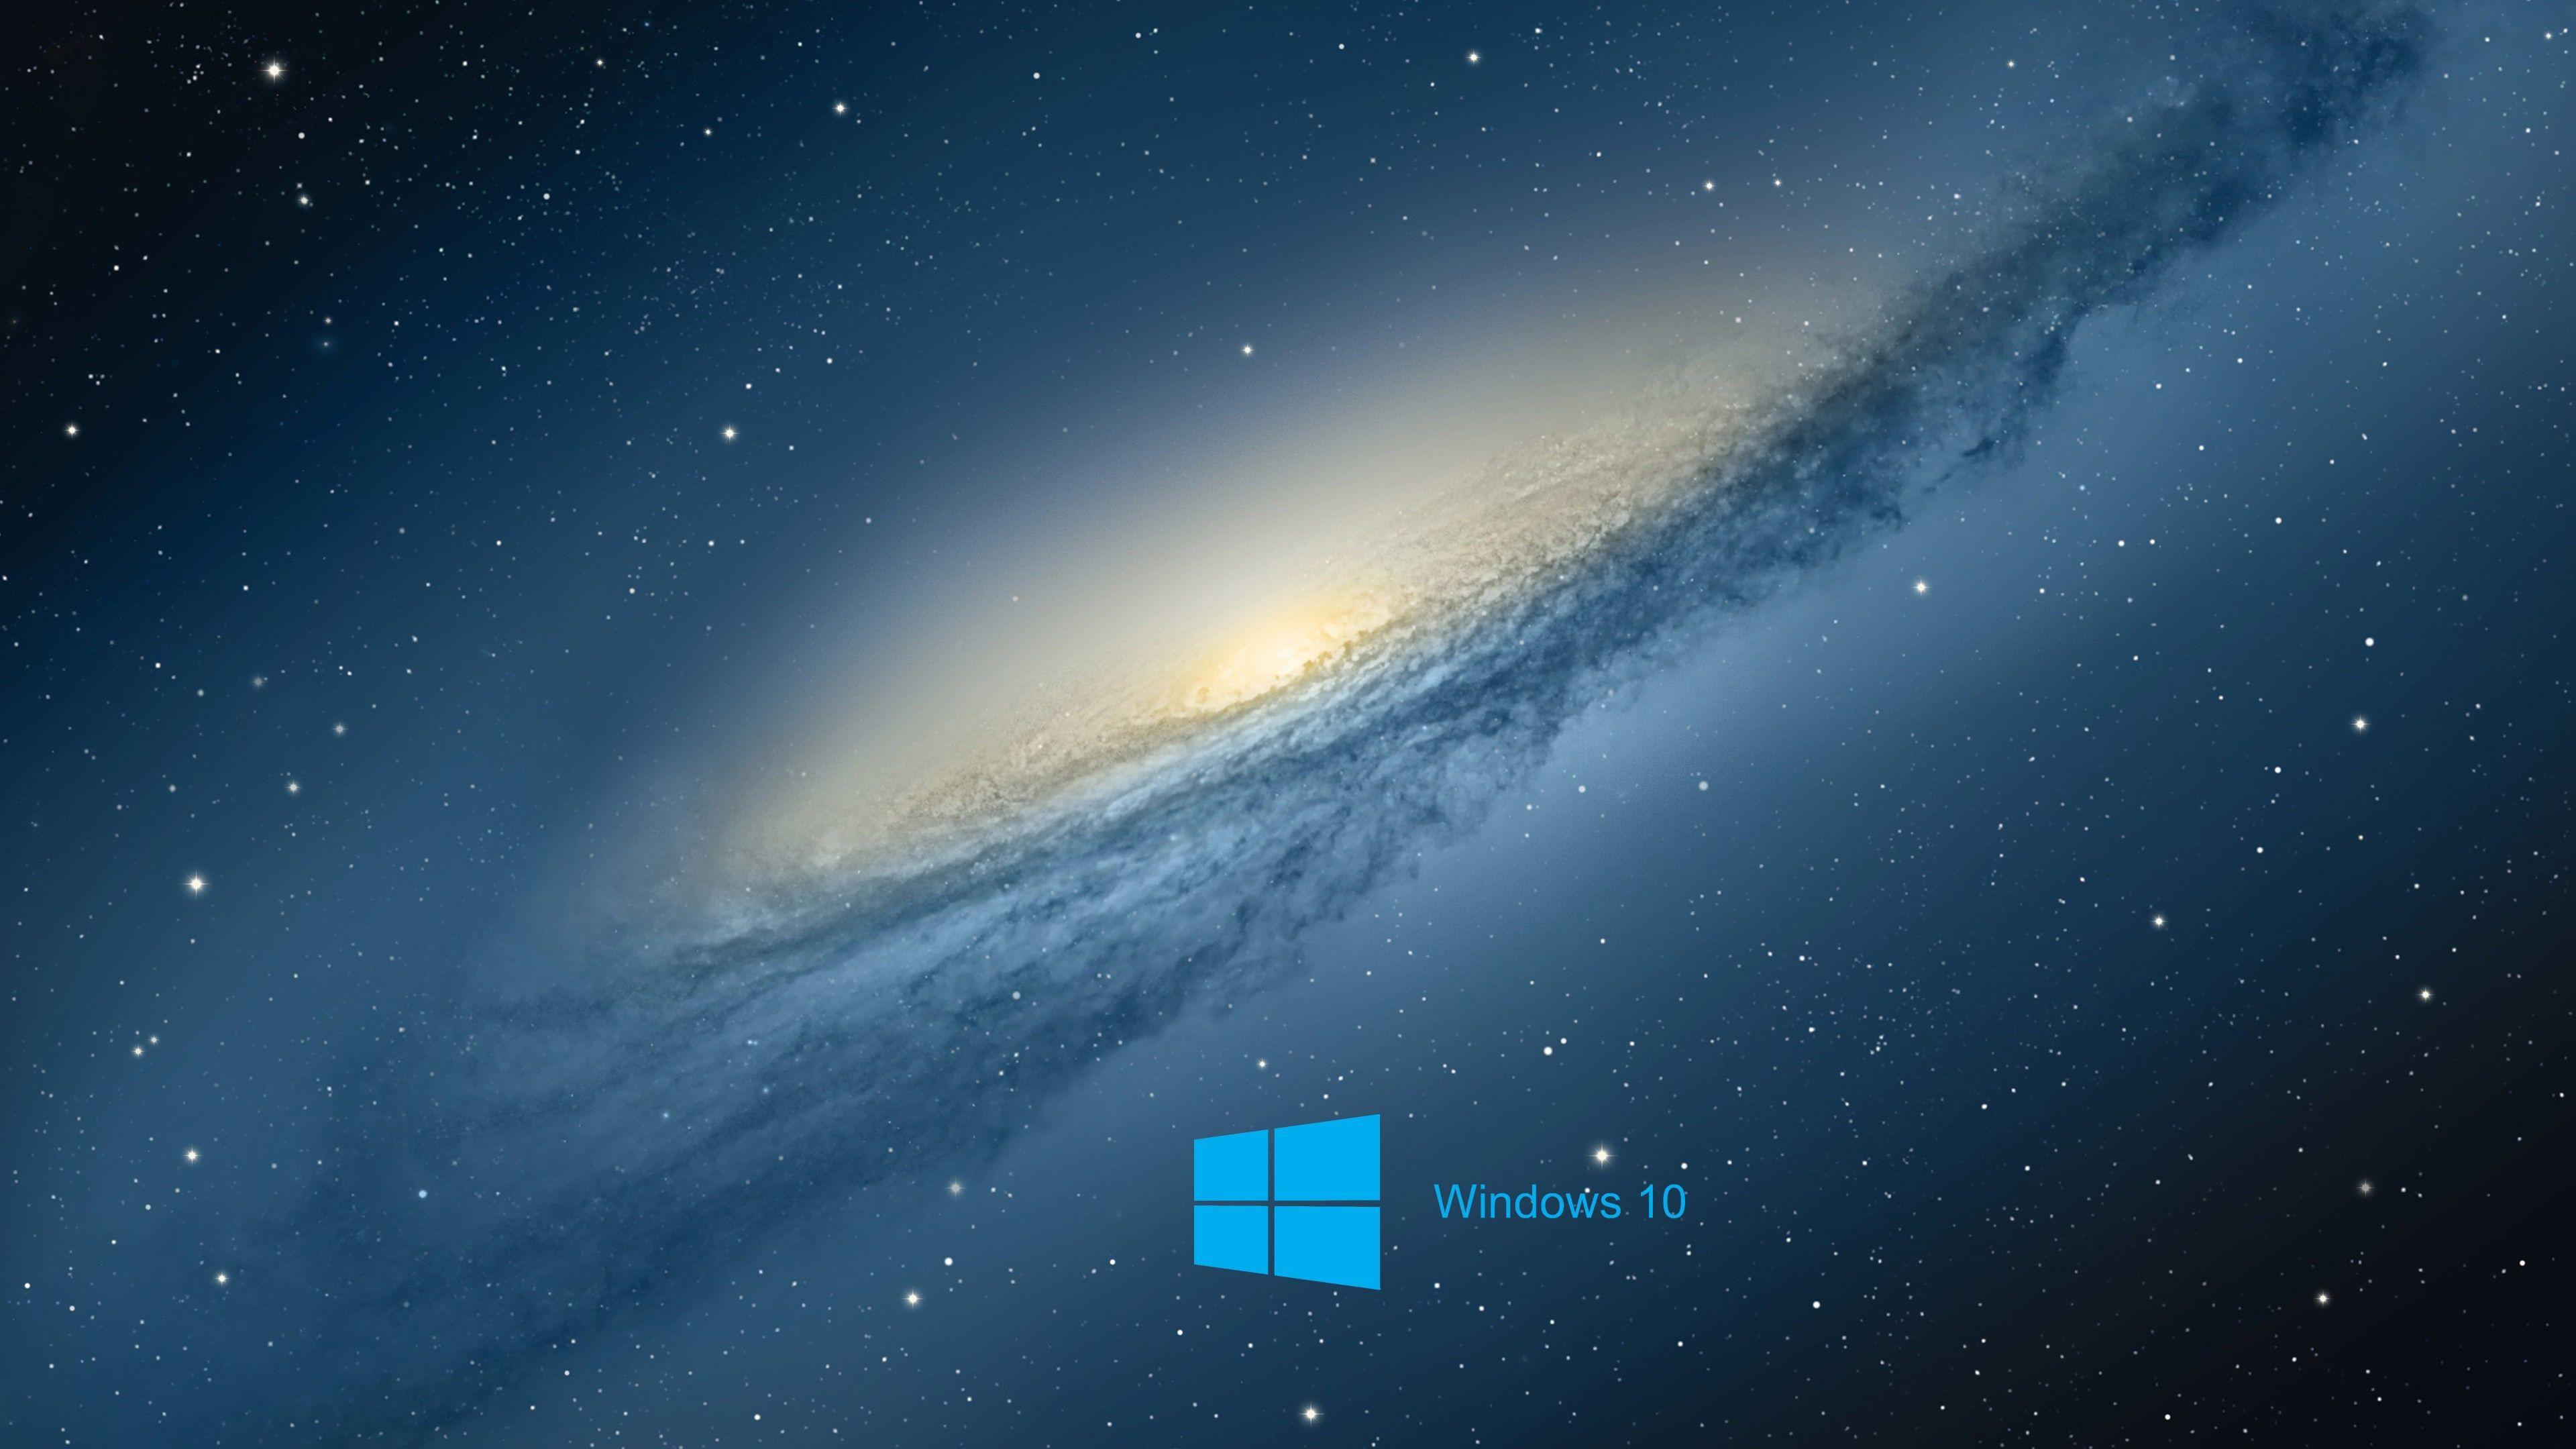 laptop wallpapers hd for windows 10 hd download | ololoshenka